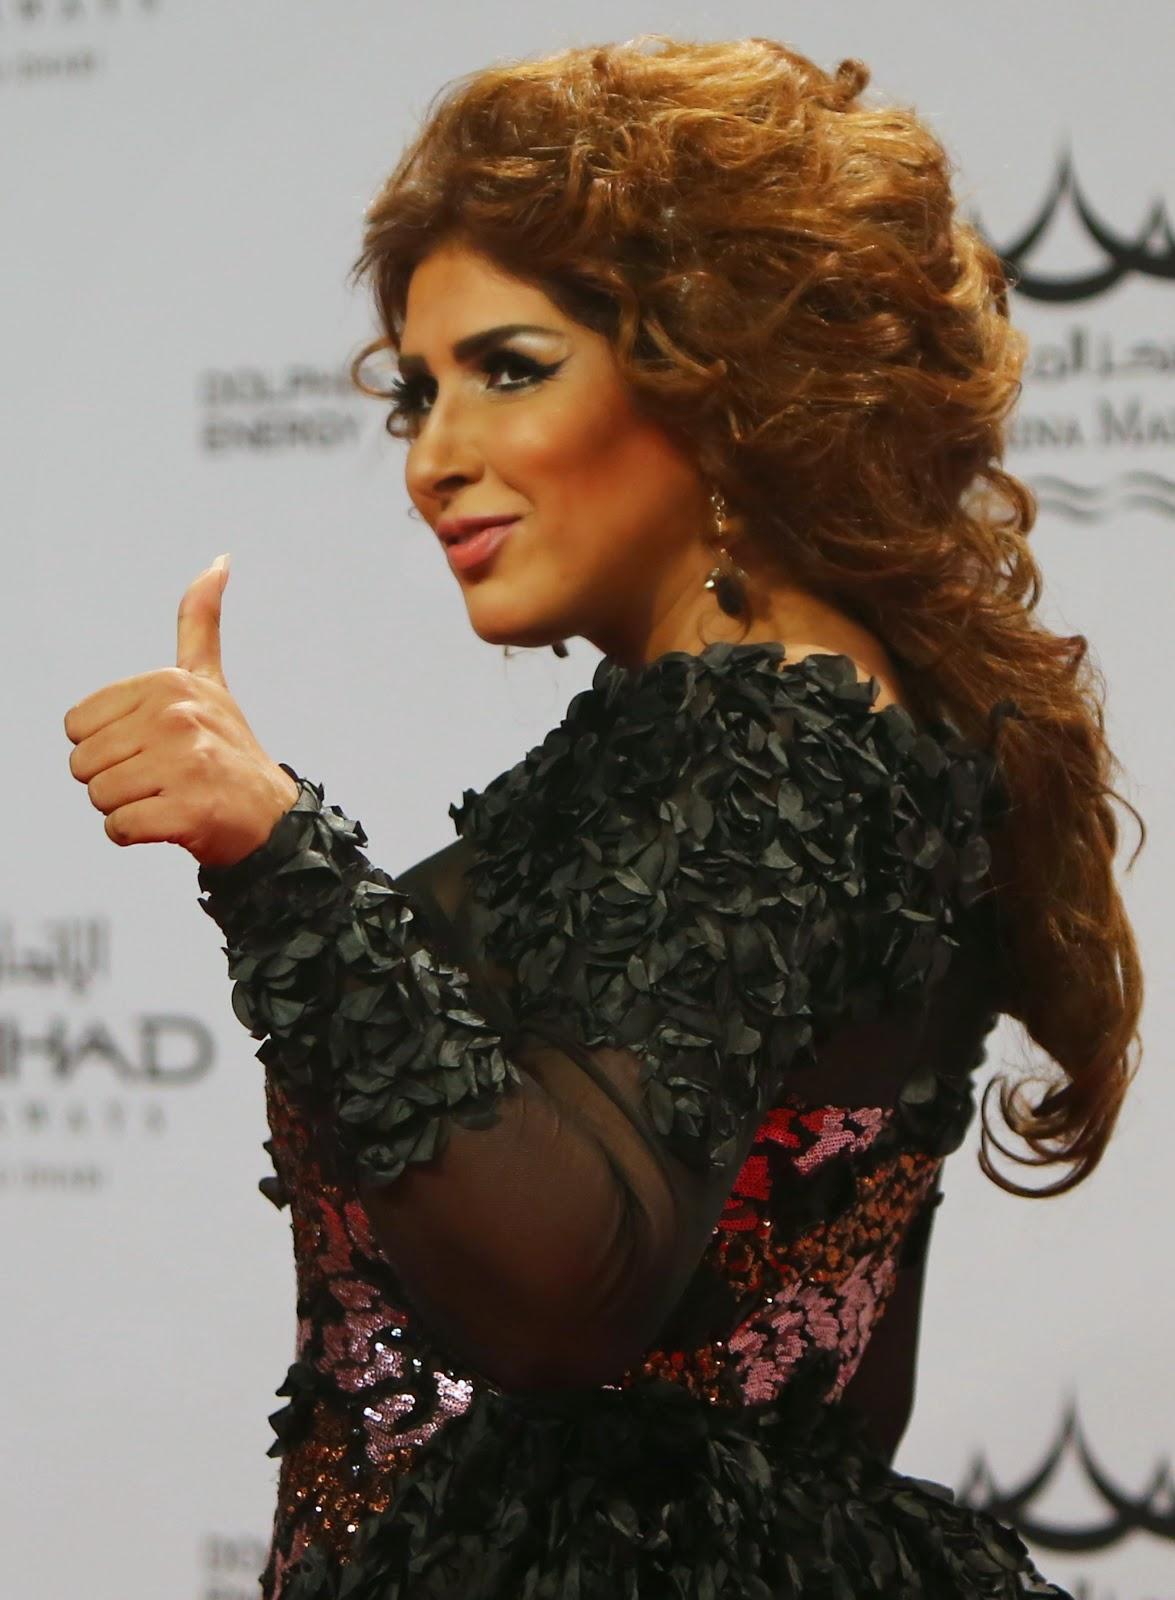 ADFF - Abu Dhabi Film Festival 2014 in HD Pictures